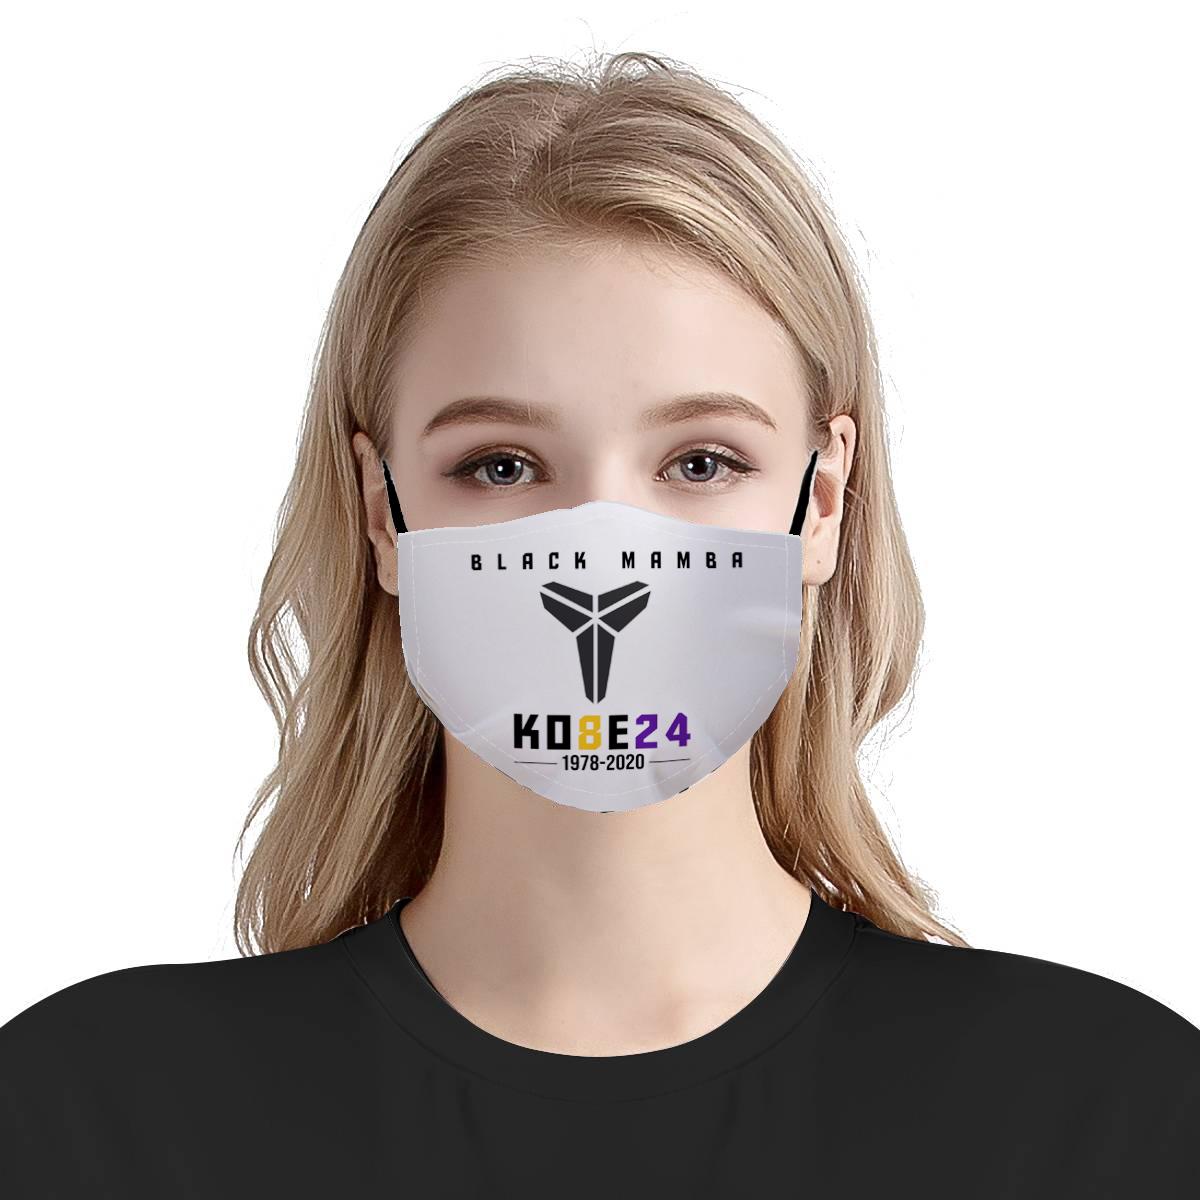 Kobe 24 black mamba 1978-2020 all over printed face mask 1